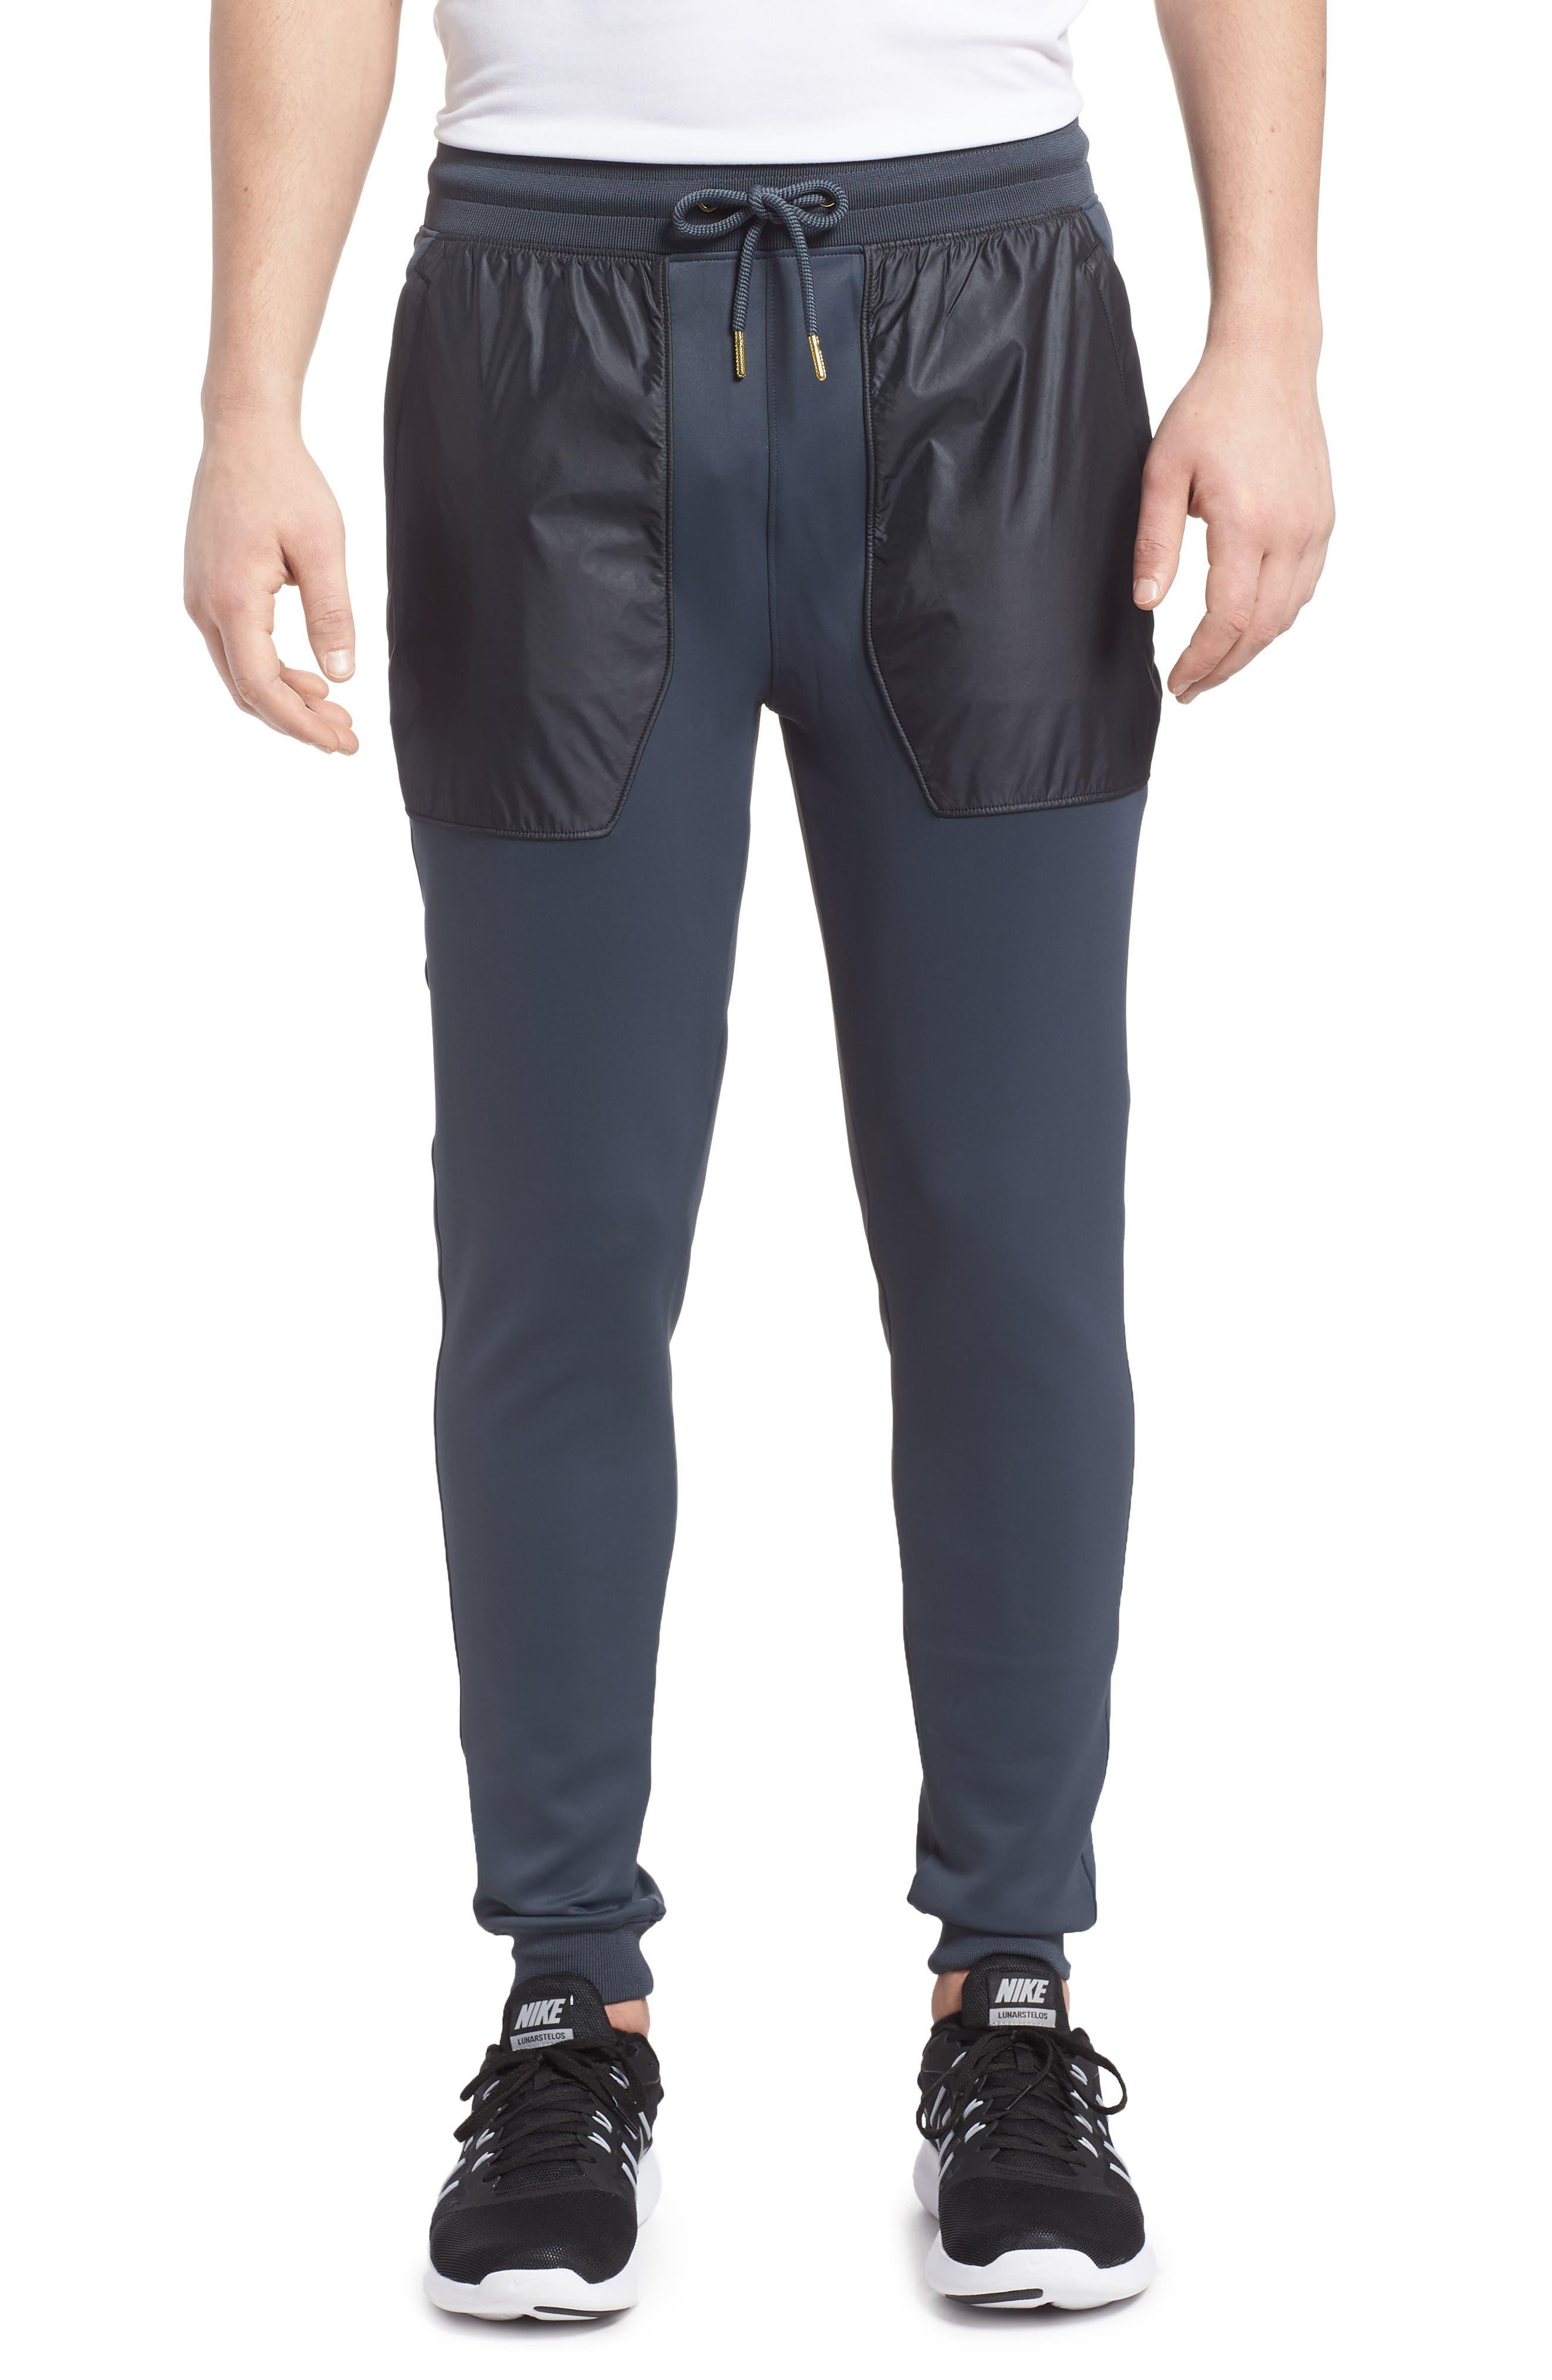 Utility Jogger Pants,                             Main thumbnail 1, color,                             Stealth Gray/ Black